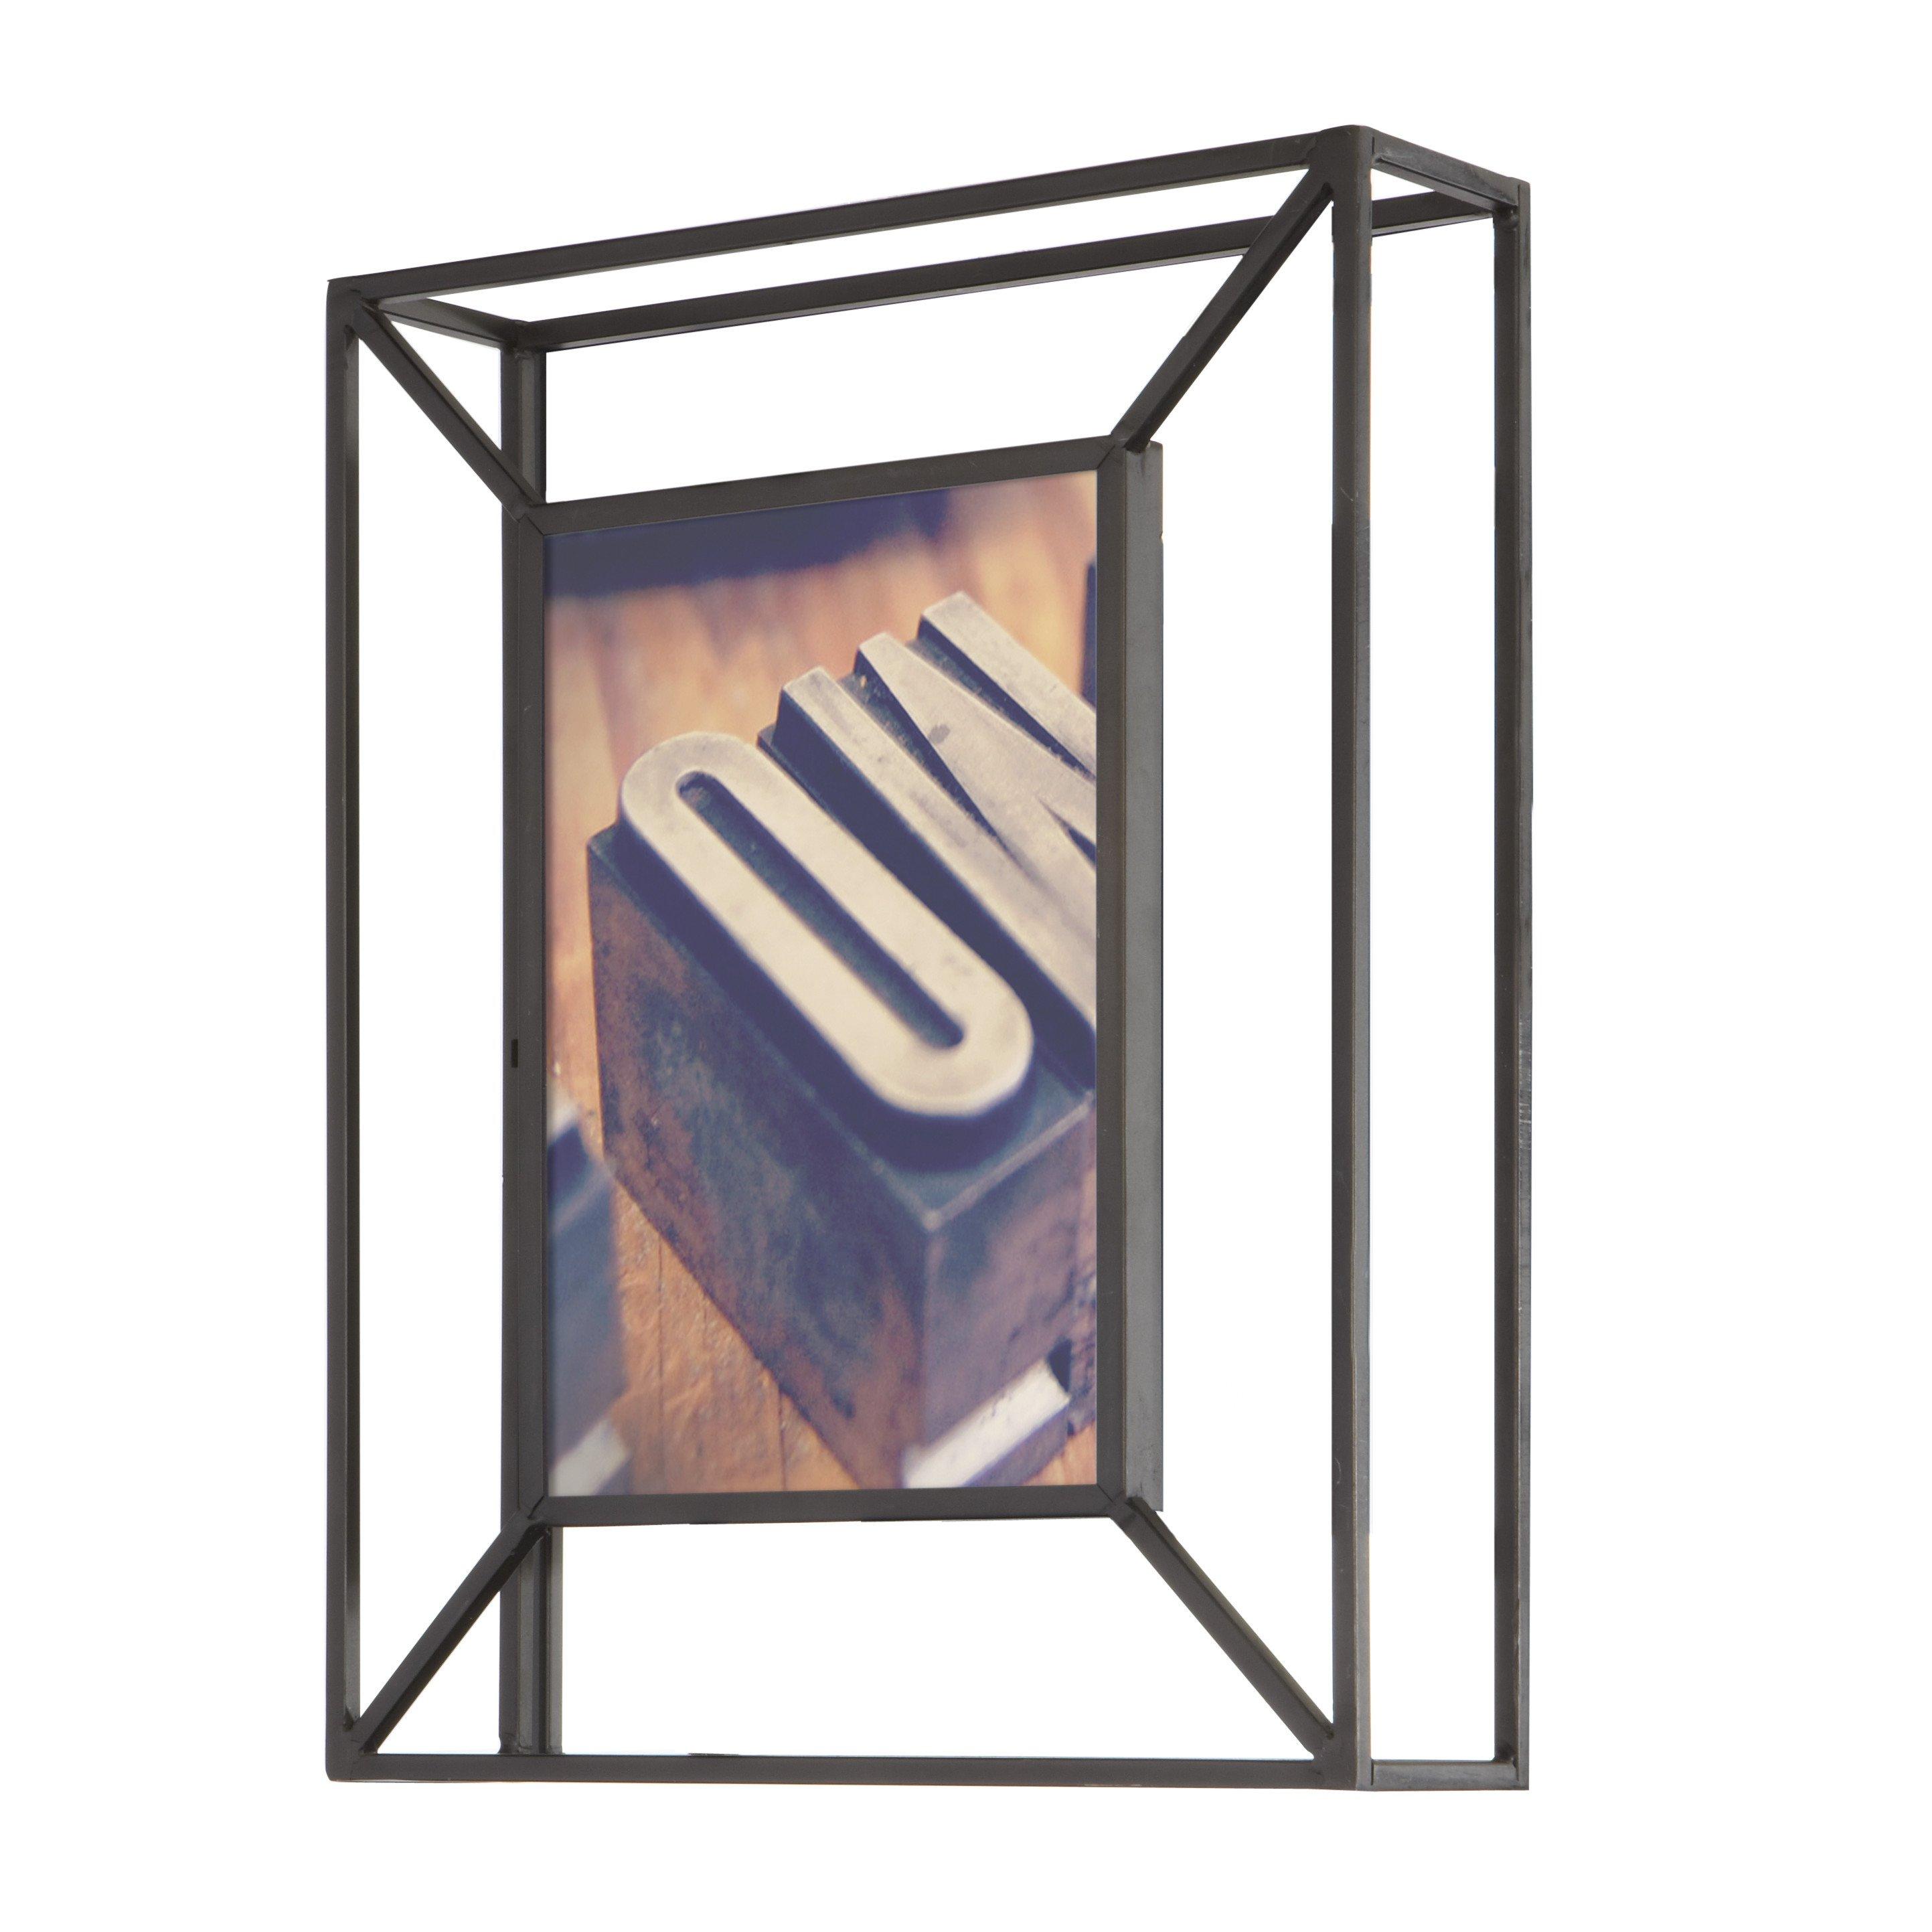 Umbra Matrix Photo Frame Black (1)